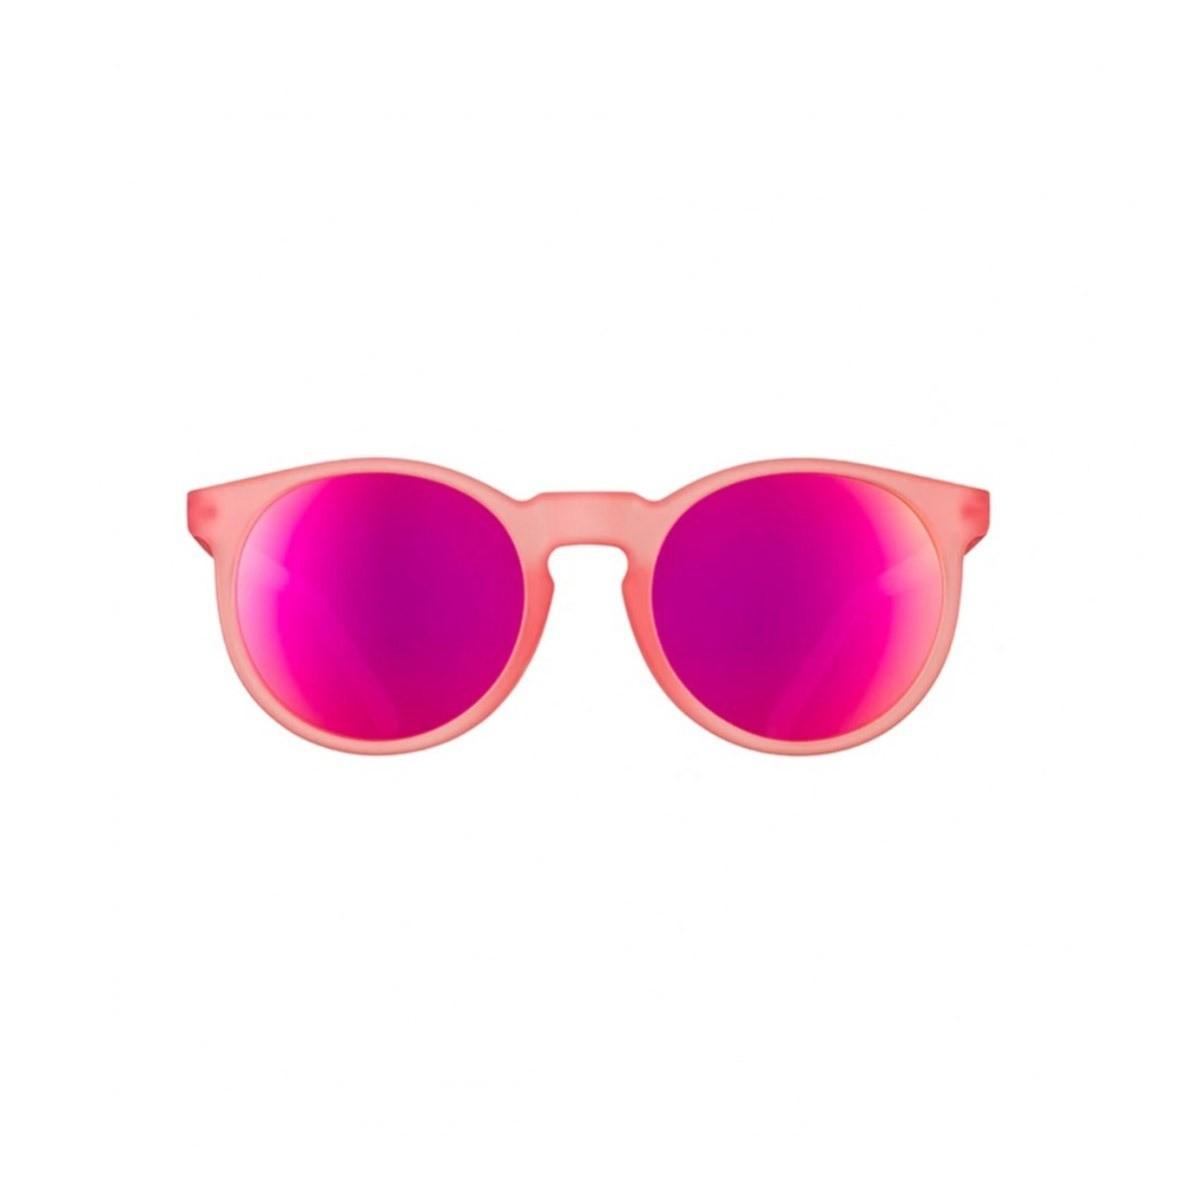 Oculos de Sol Goodr - Influencers Pay Double